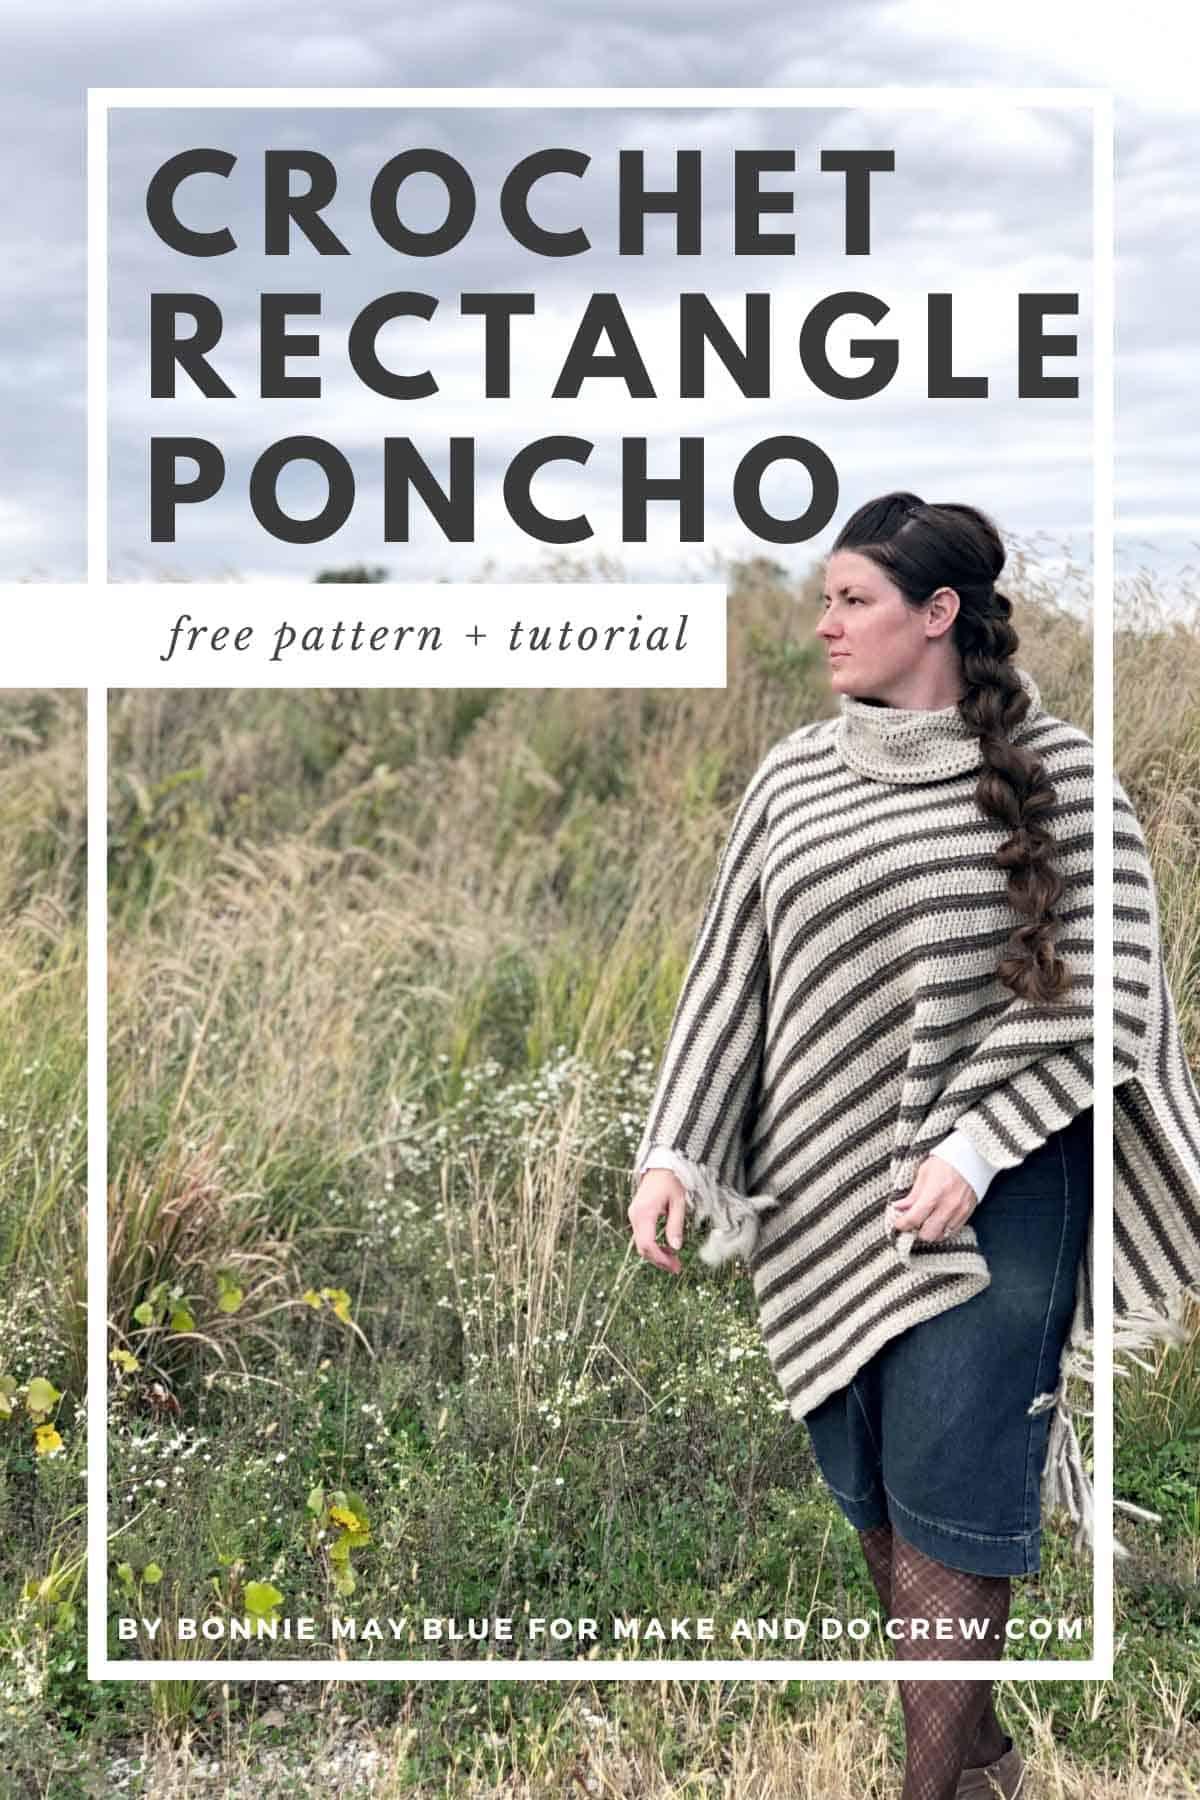 Woman wearing a crochet poncho with fringe standing in an open field.